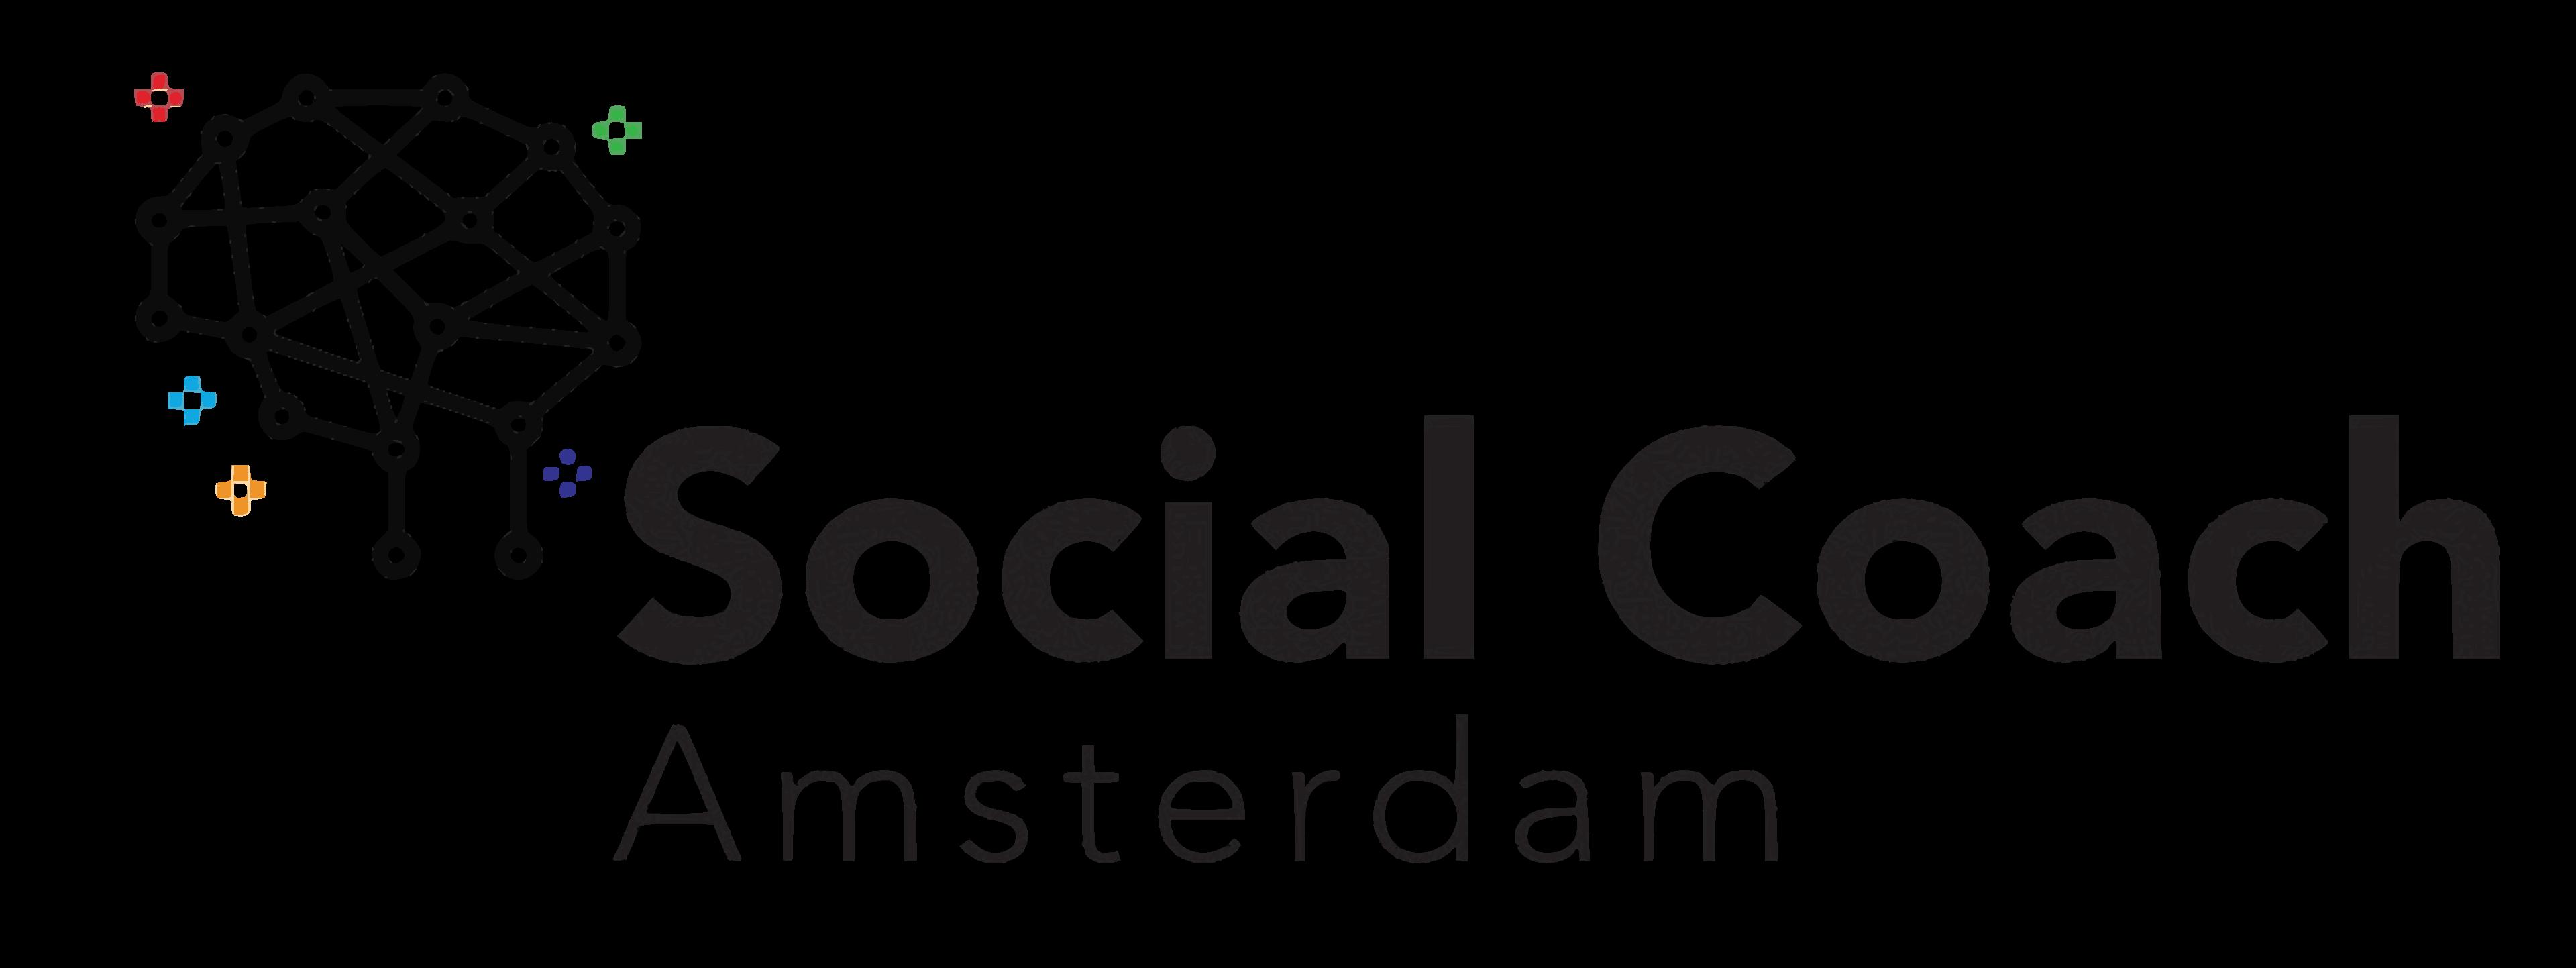 Social Coach Amsterdam